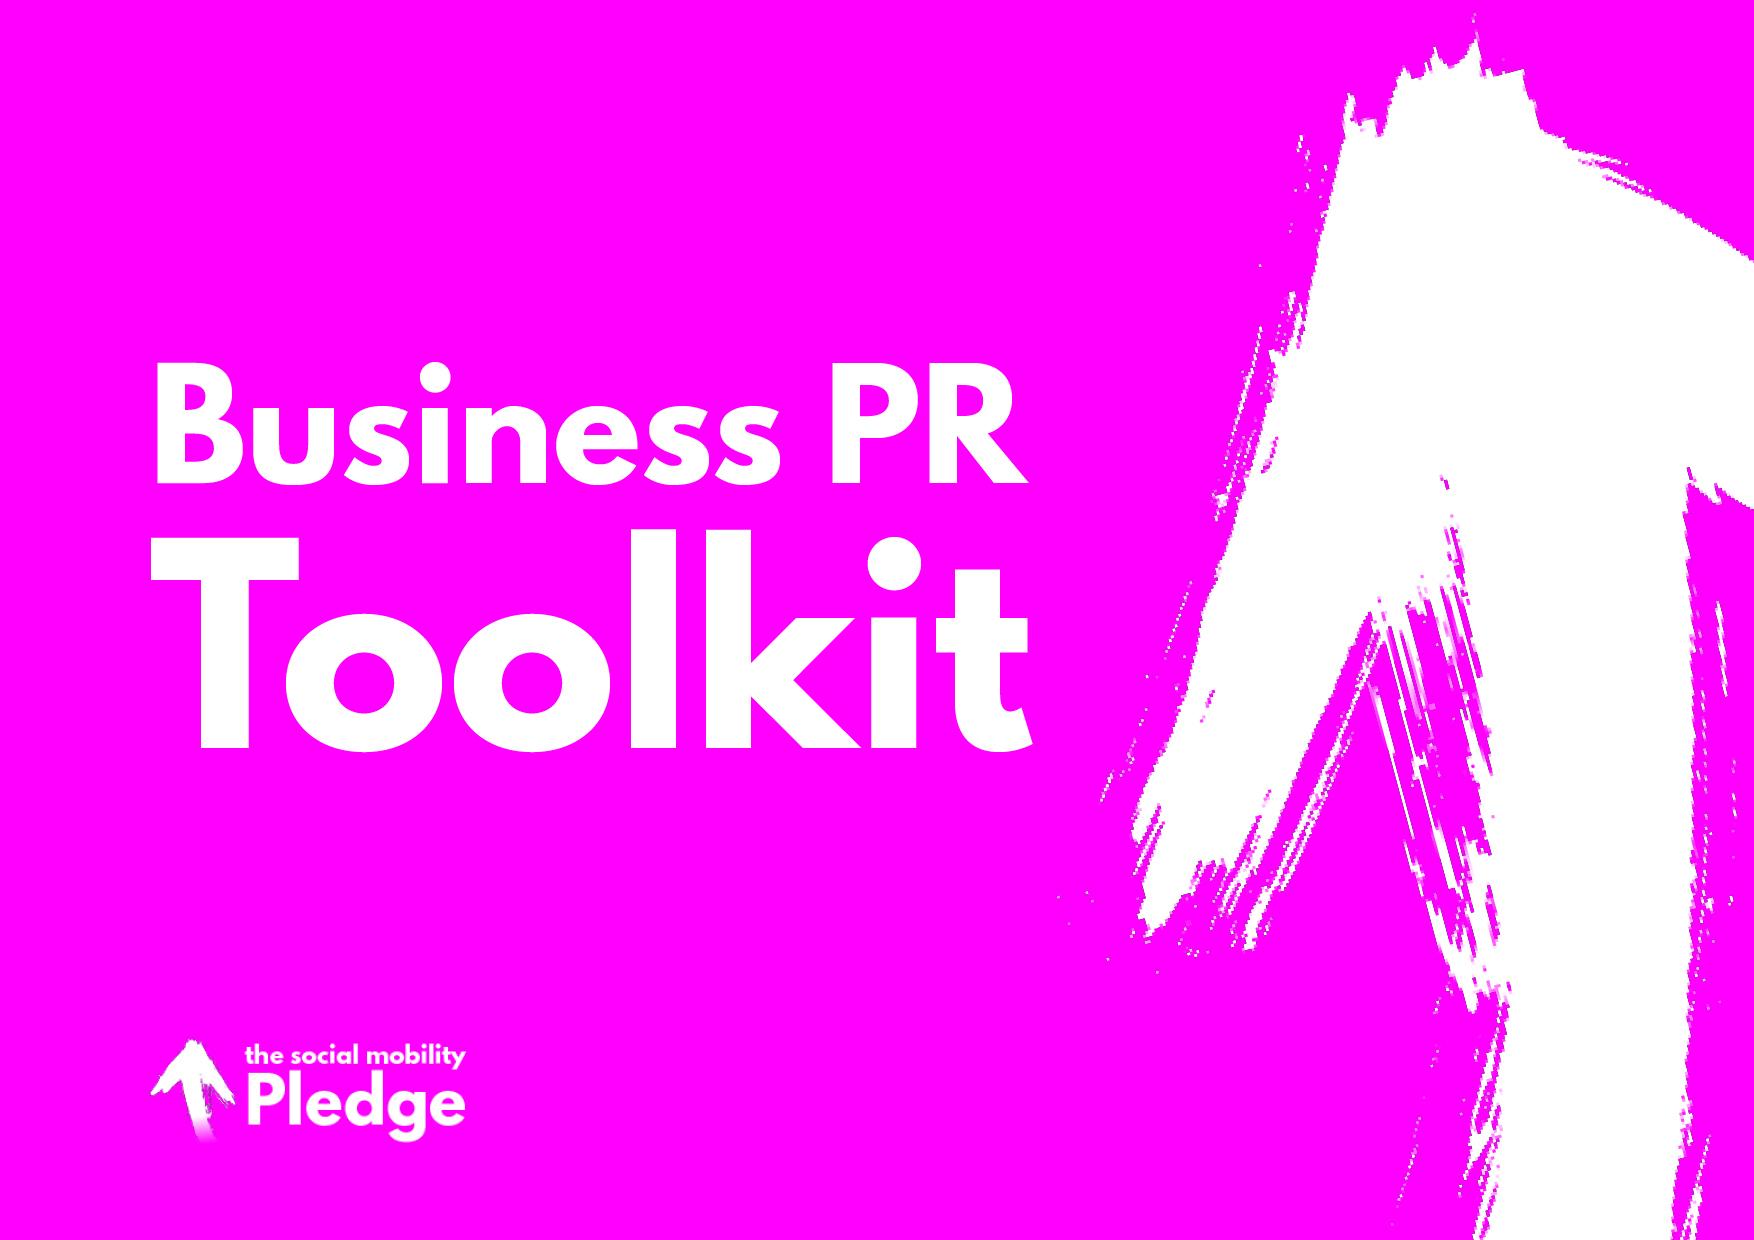 BusinessPRToolkit.jpg